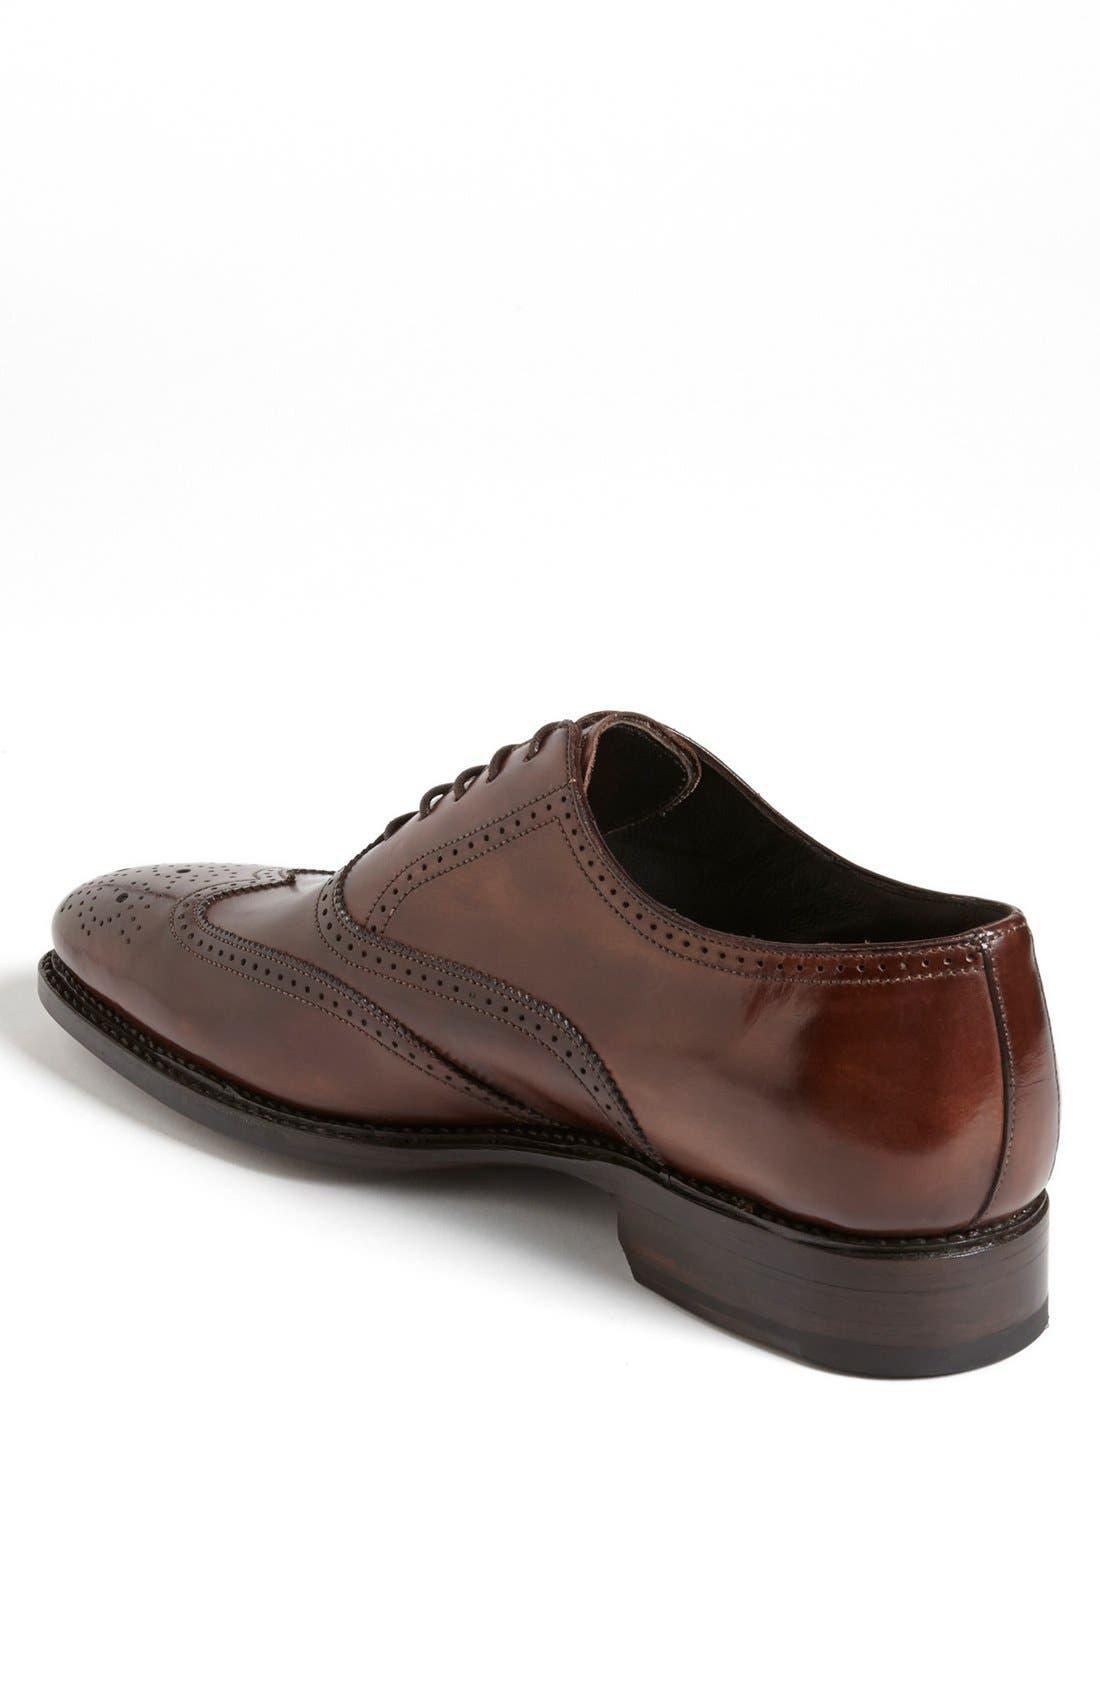 Alternate Image 2  - Canali Leather Wingtip (Men)